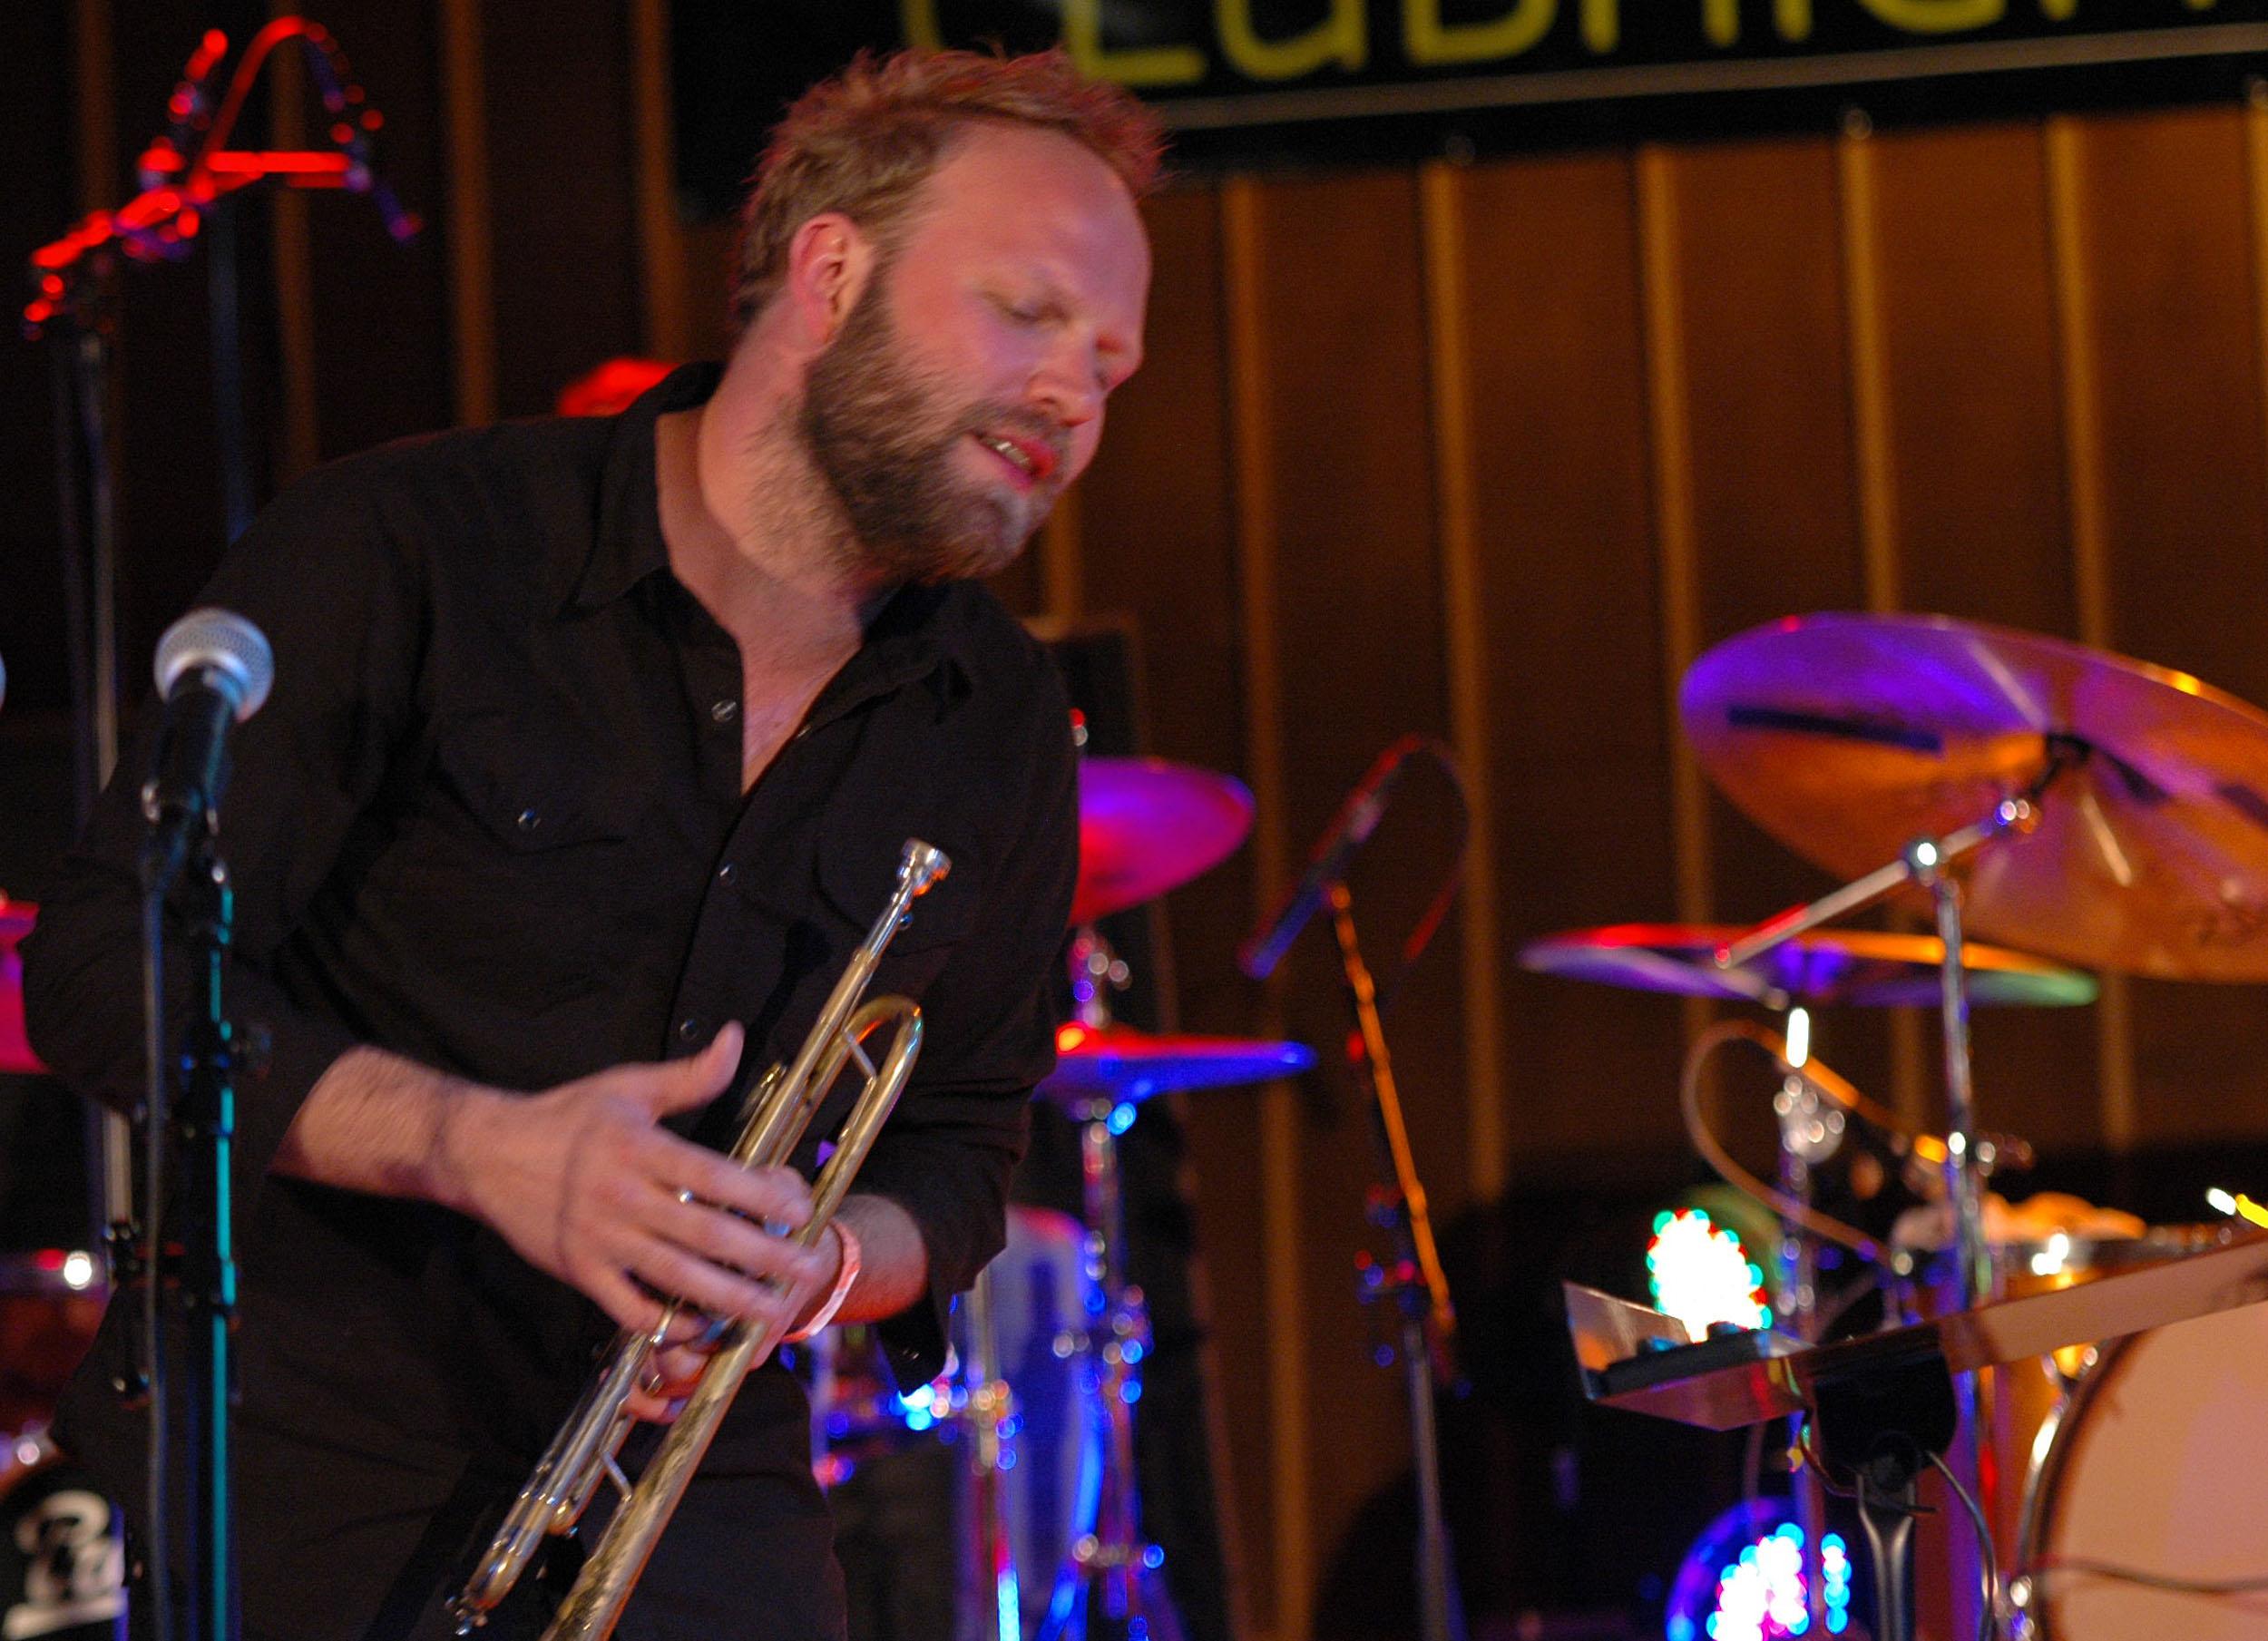 Mathias Eick, Jazzahead 2011